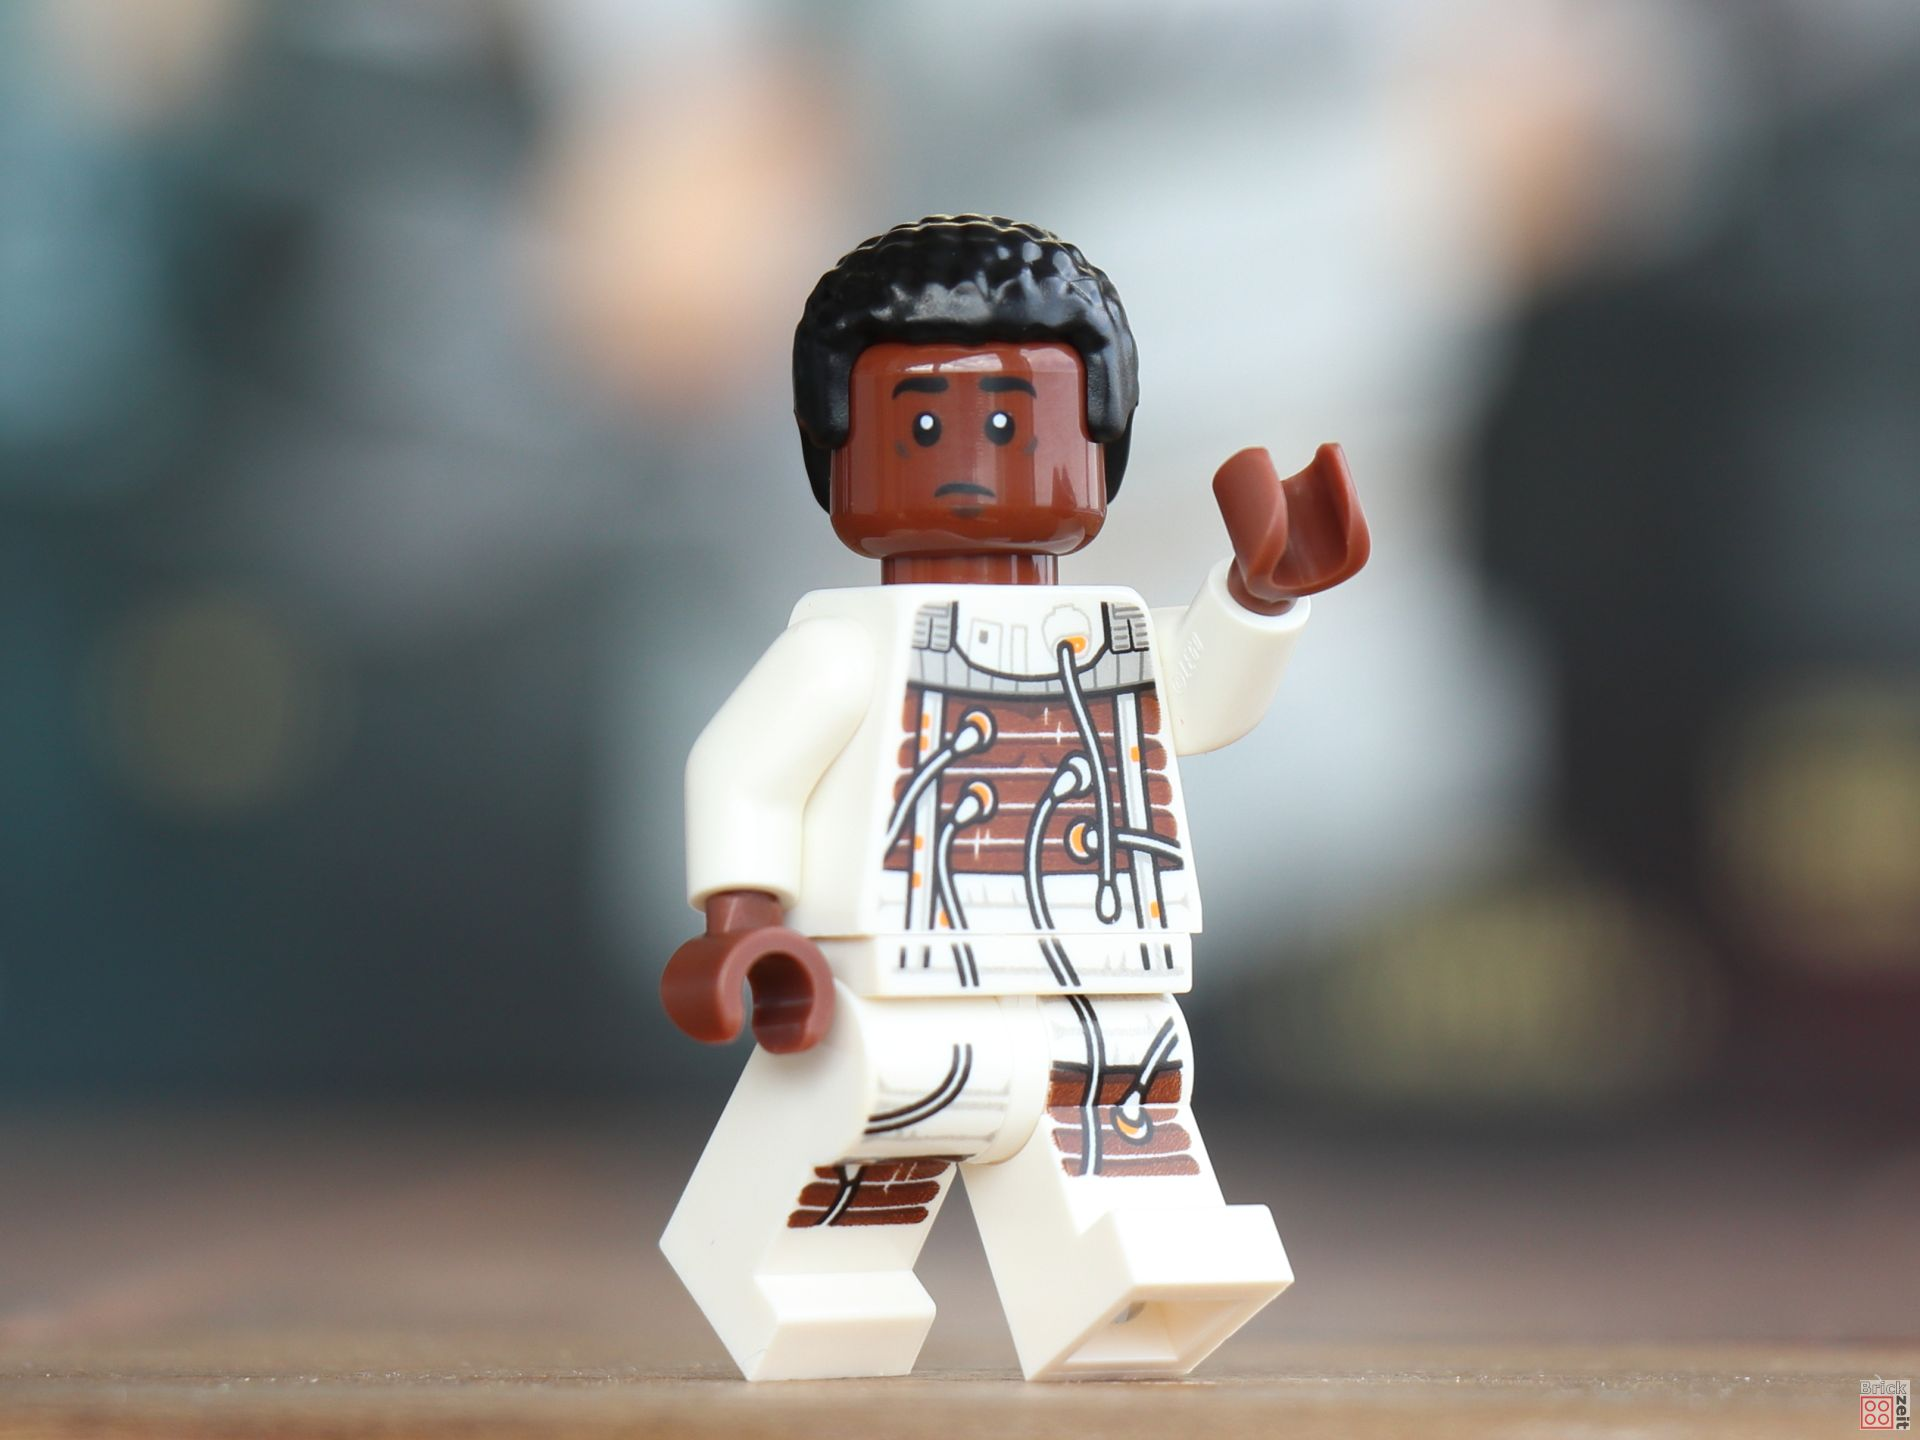 1x Lego Technic Knights/' Kingdom Schild grau Ochsen Adric 8704 4277417 54180pb01